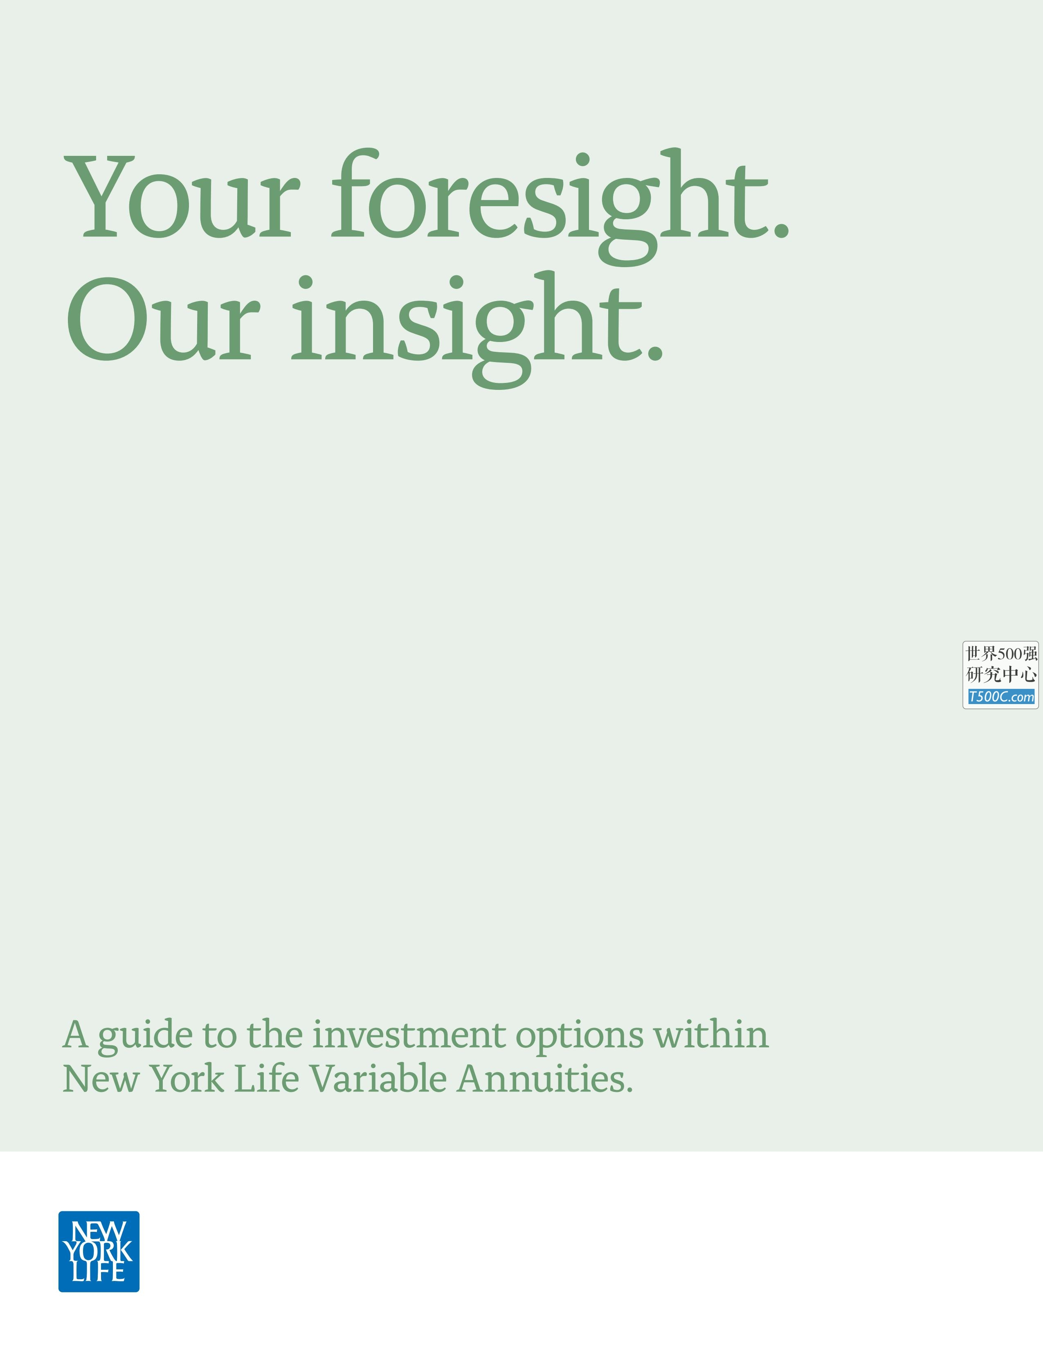 纽约人寿NewYorkLife_见解宣传册Brochure_T500C.com_Investment-Brochure.pdf